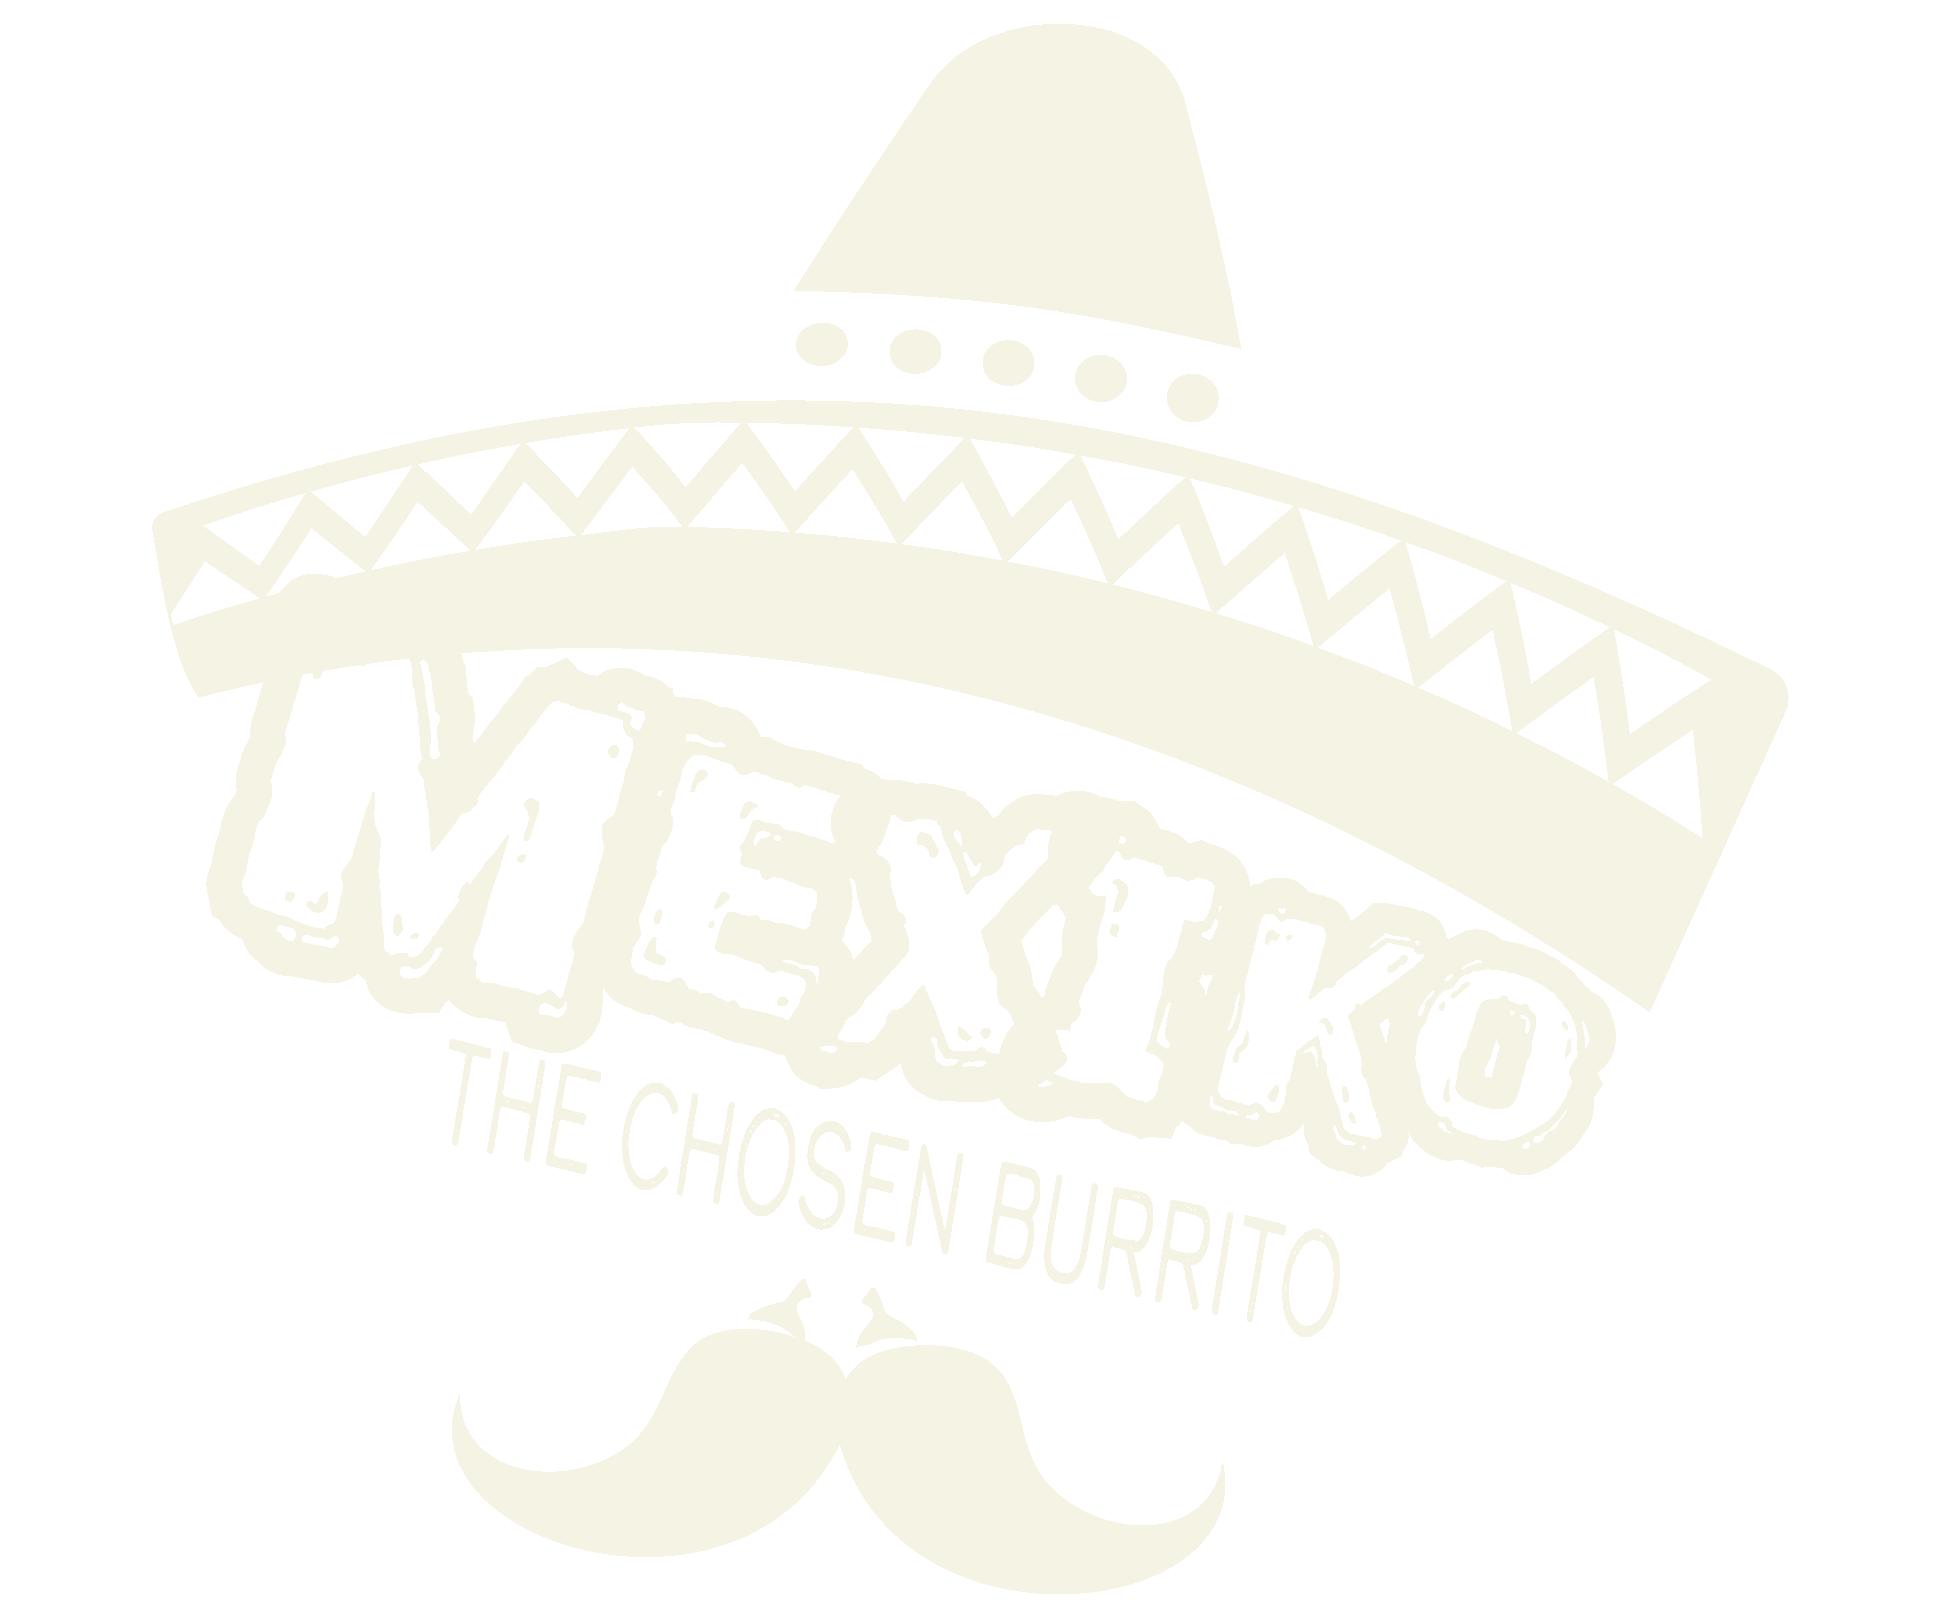 mexiko large-30.png